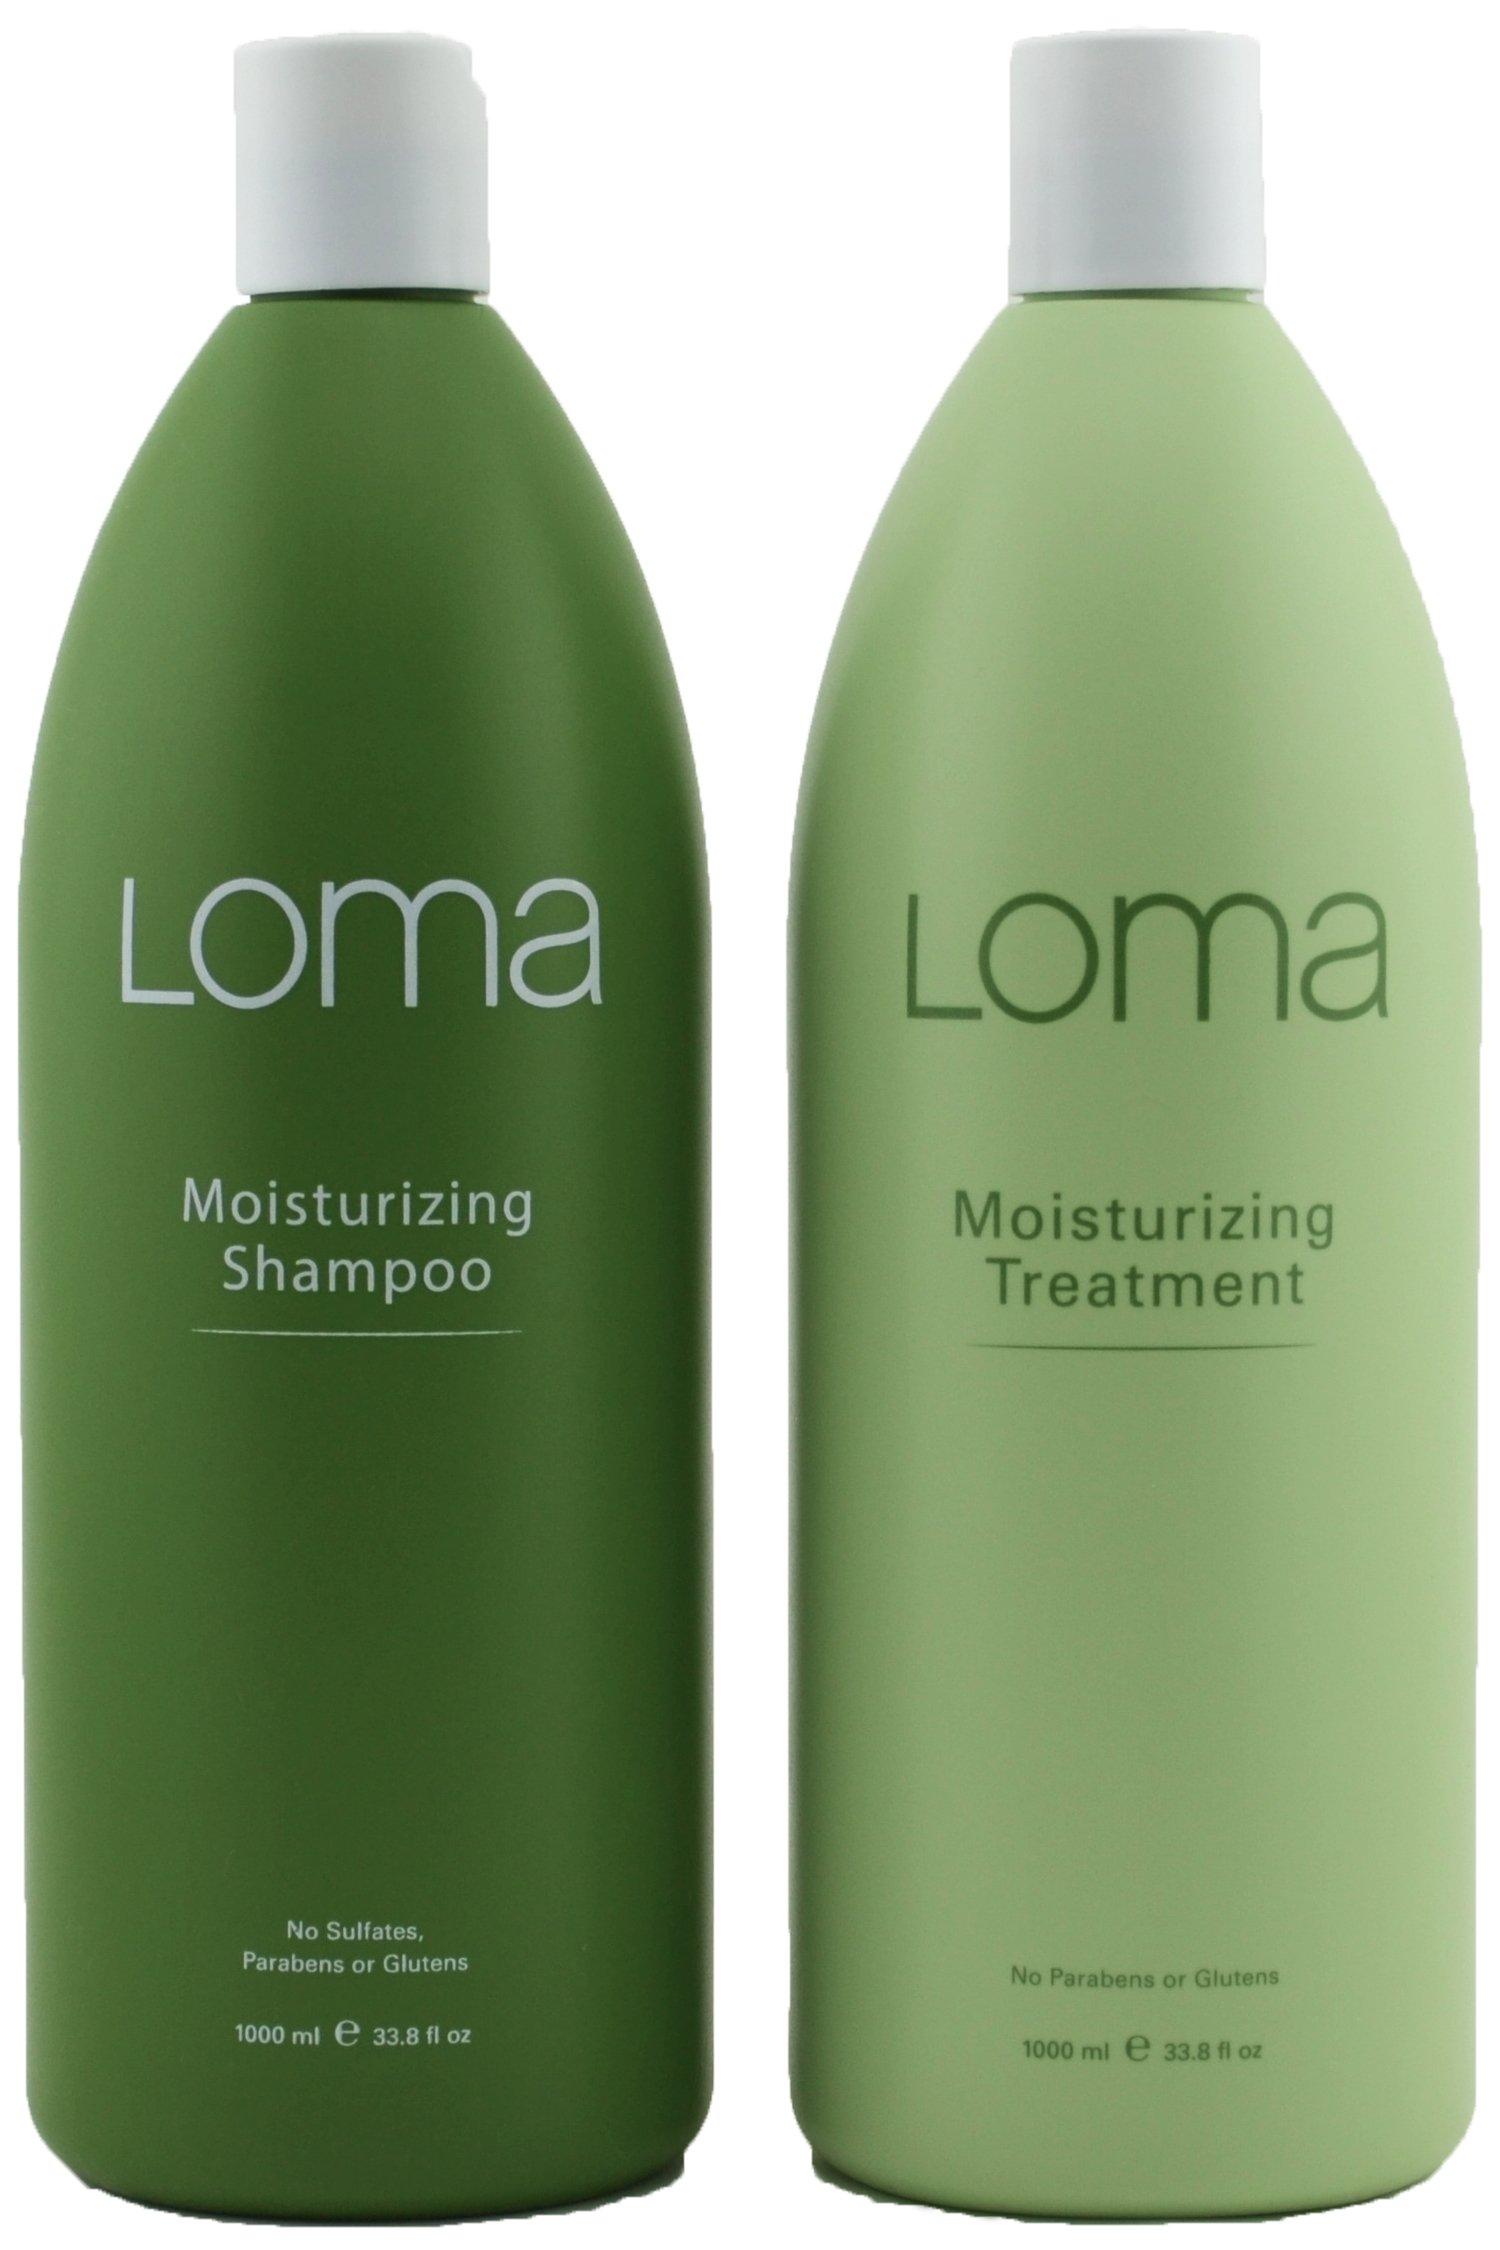 Loma Hair Care Moisturizing Shampoo Moisturizing Treatment Duo, 33 oz, Package may vary